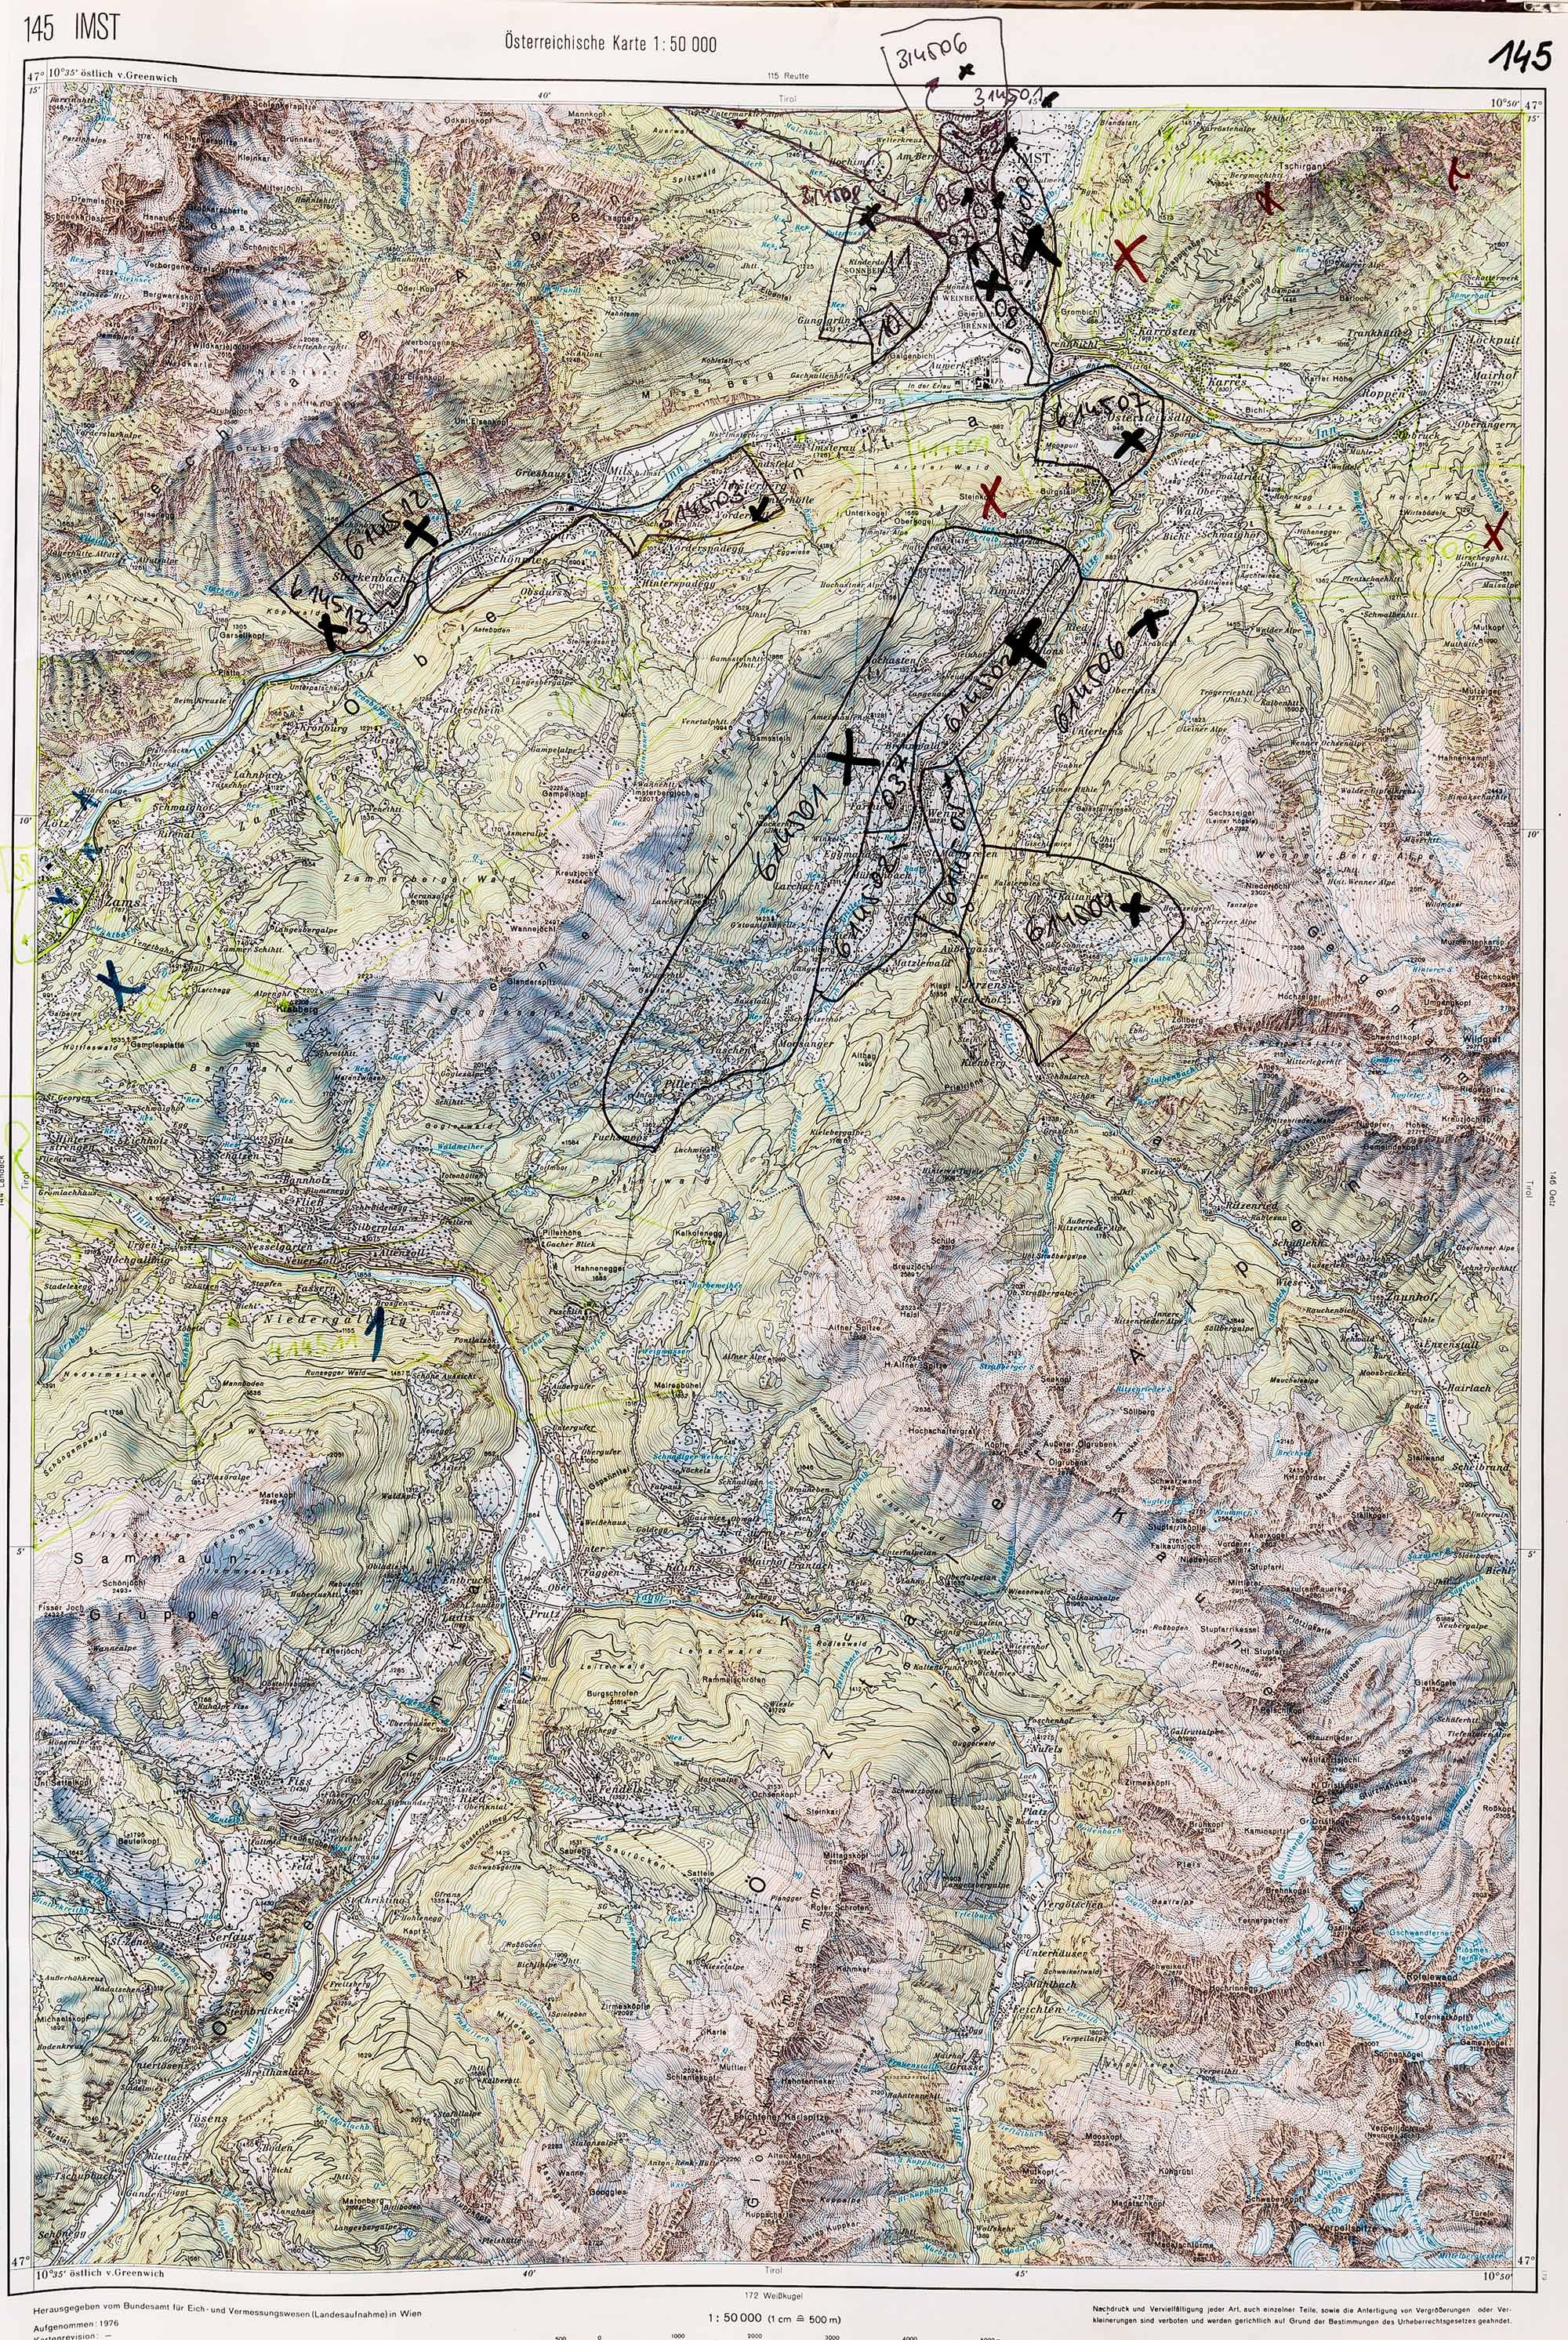 1983-1986 Karte 145